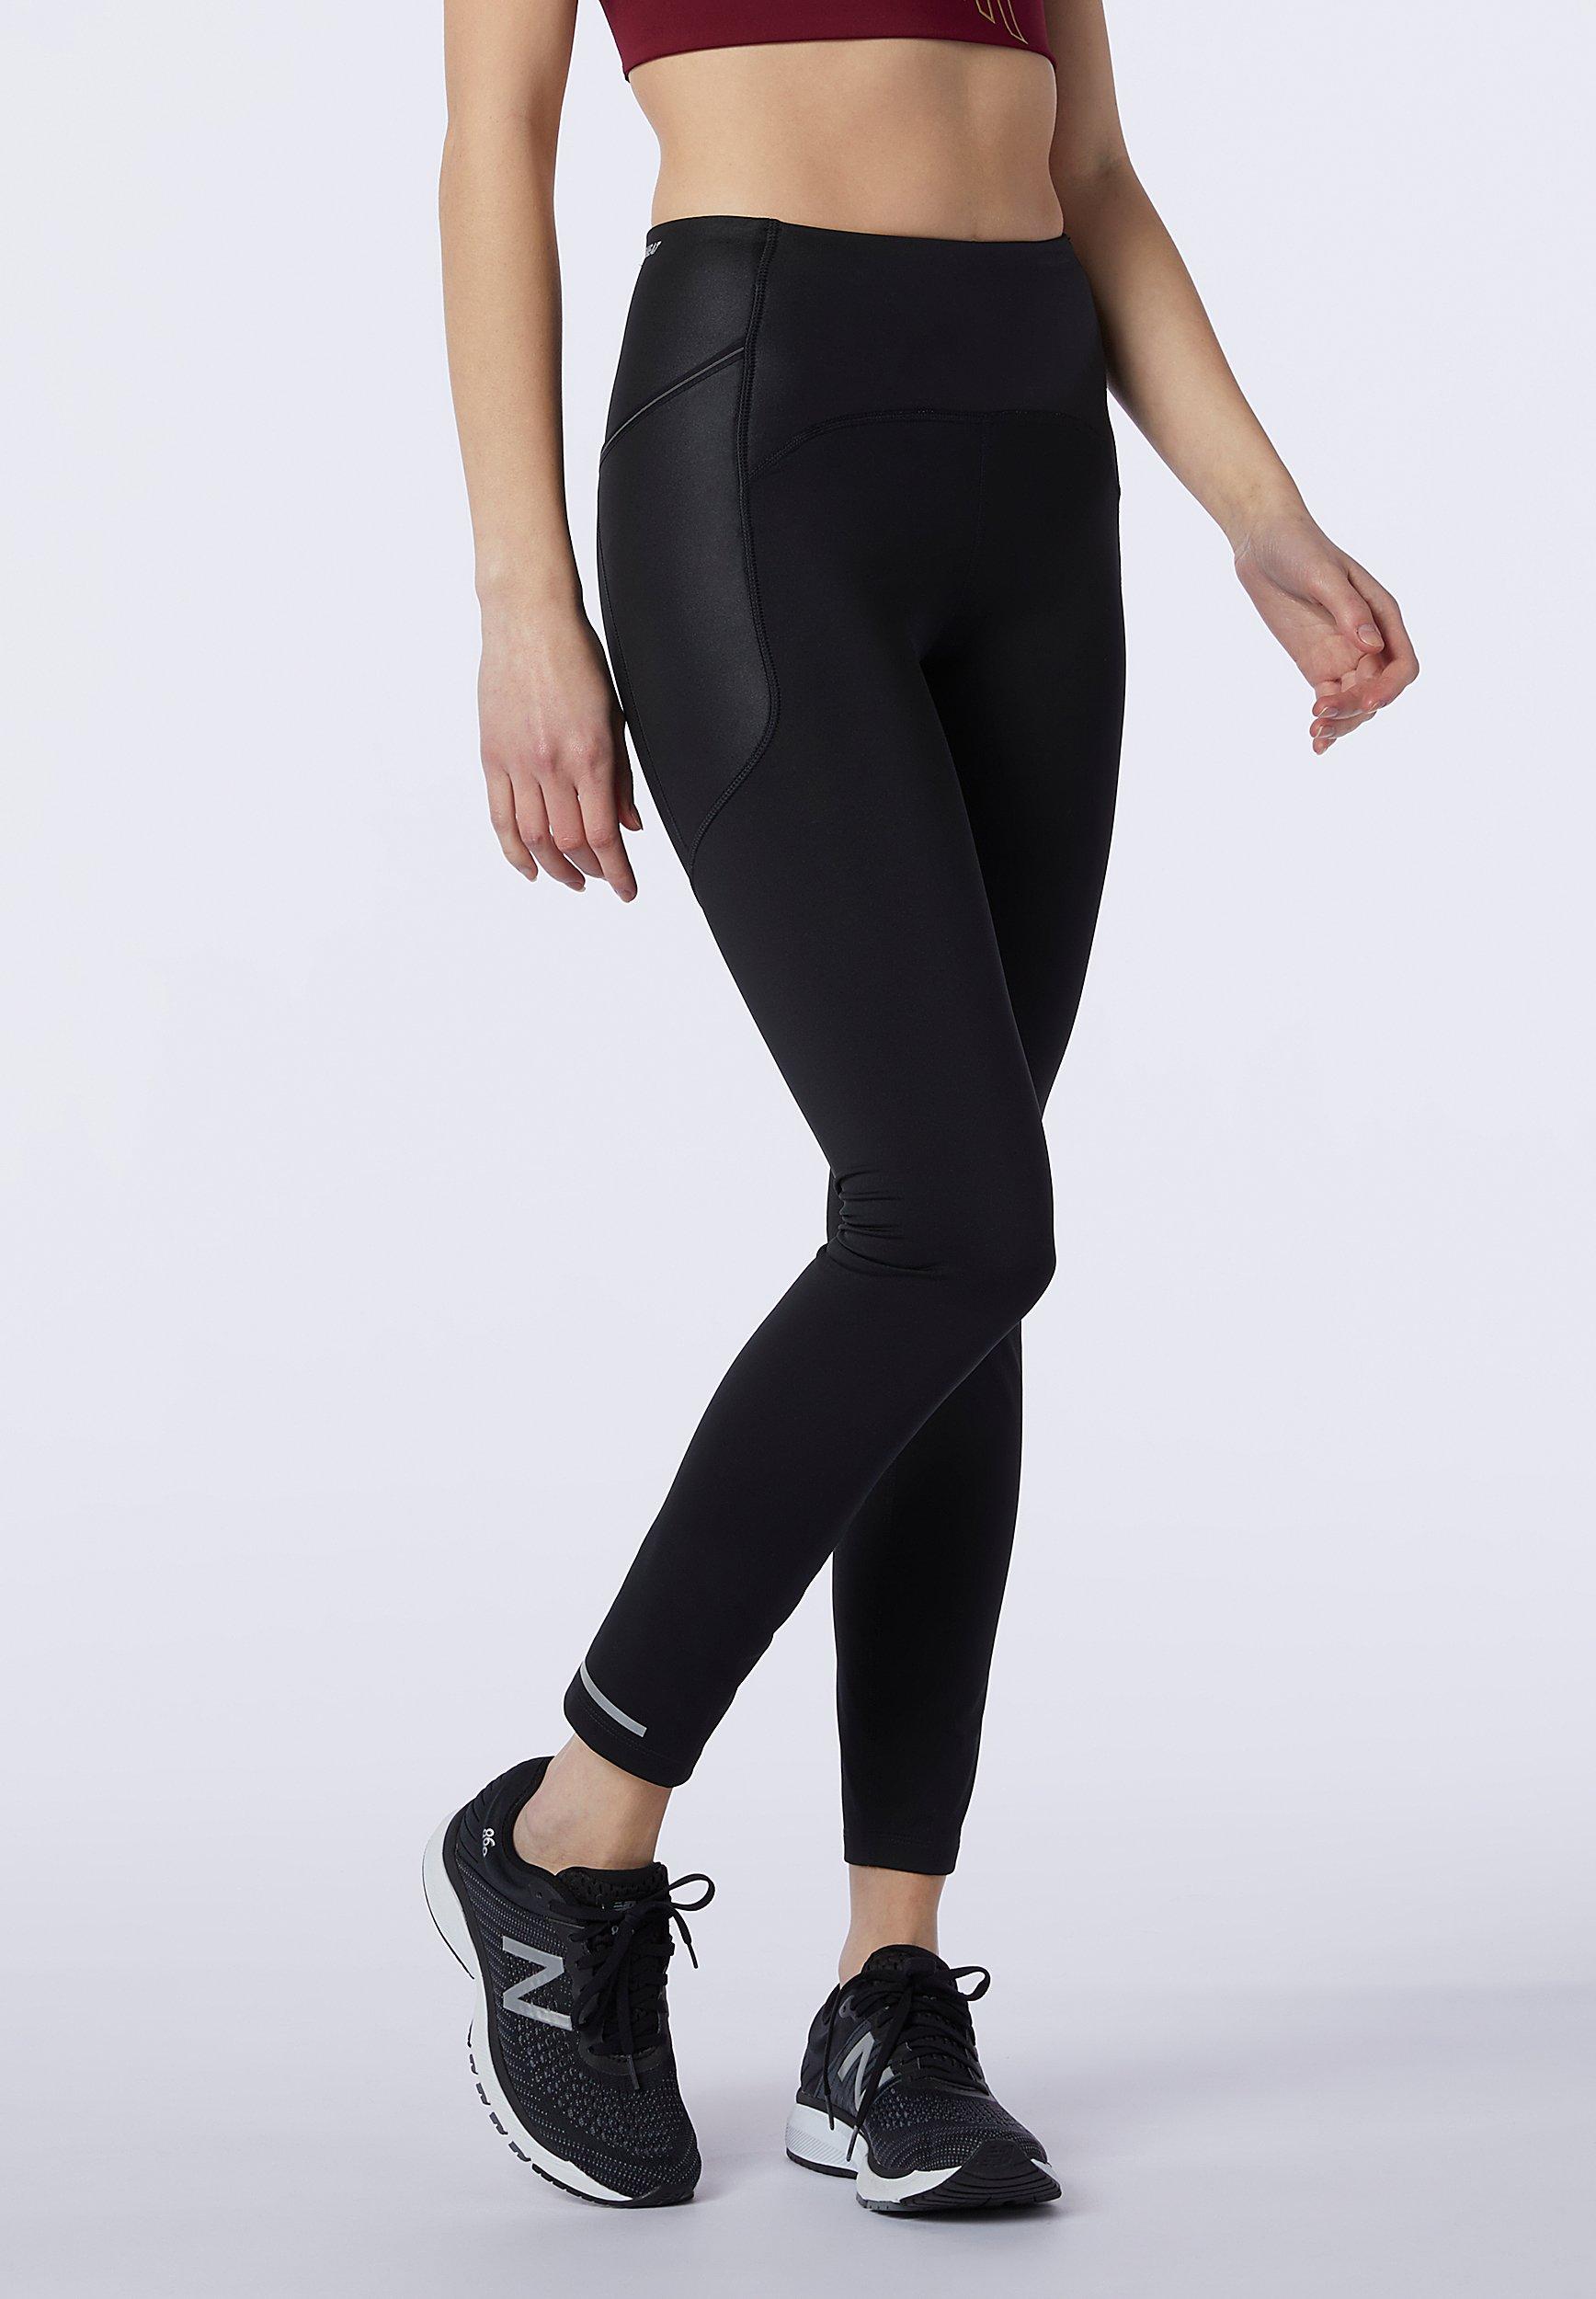 Femme IMPACT RUN HEAT TIGHT - Legging - black